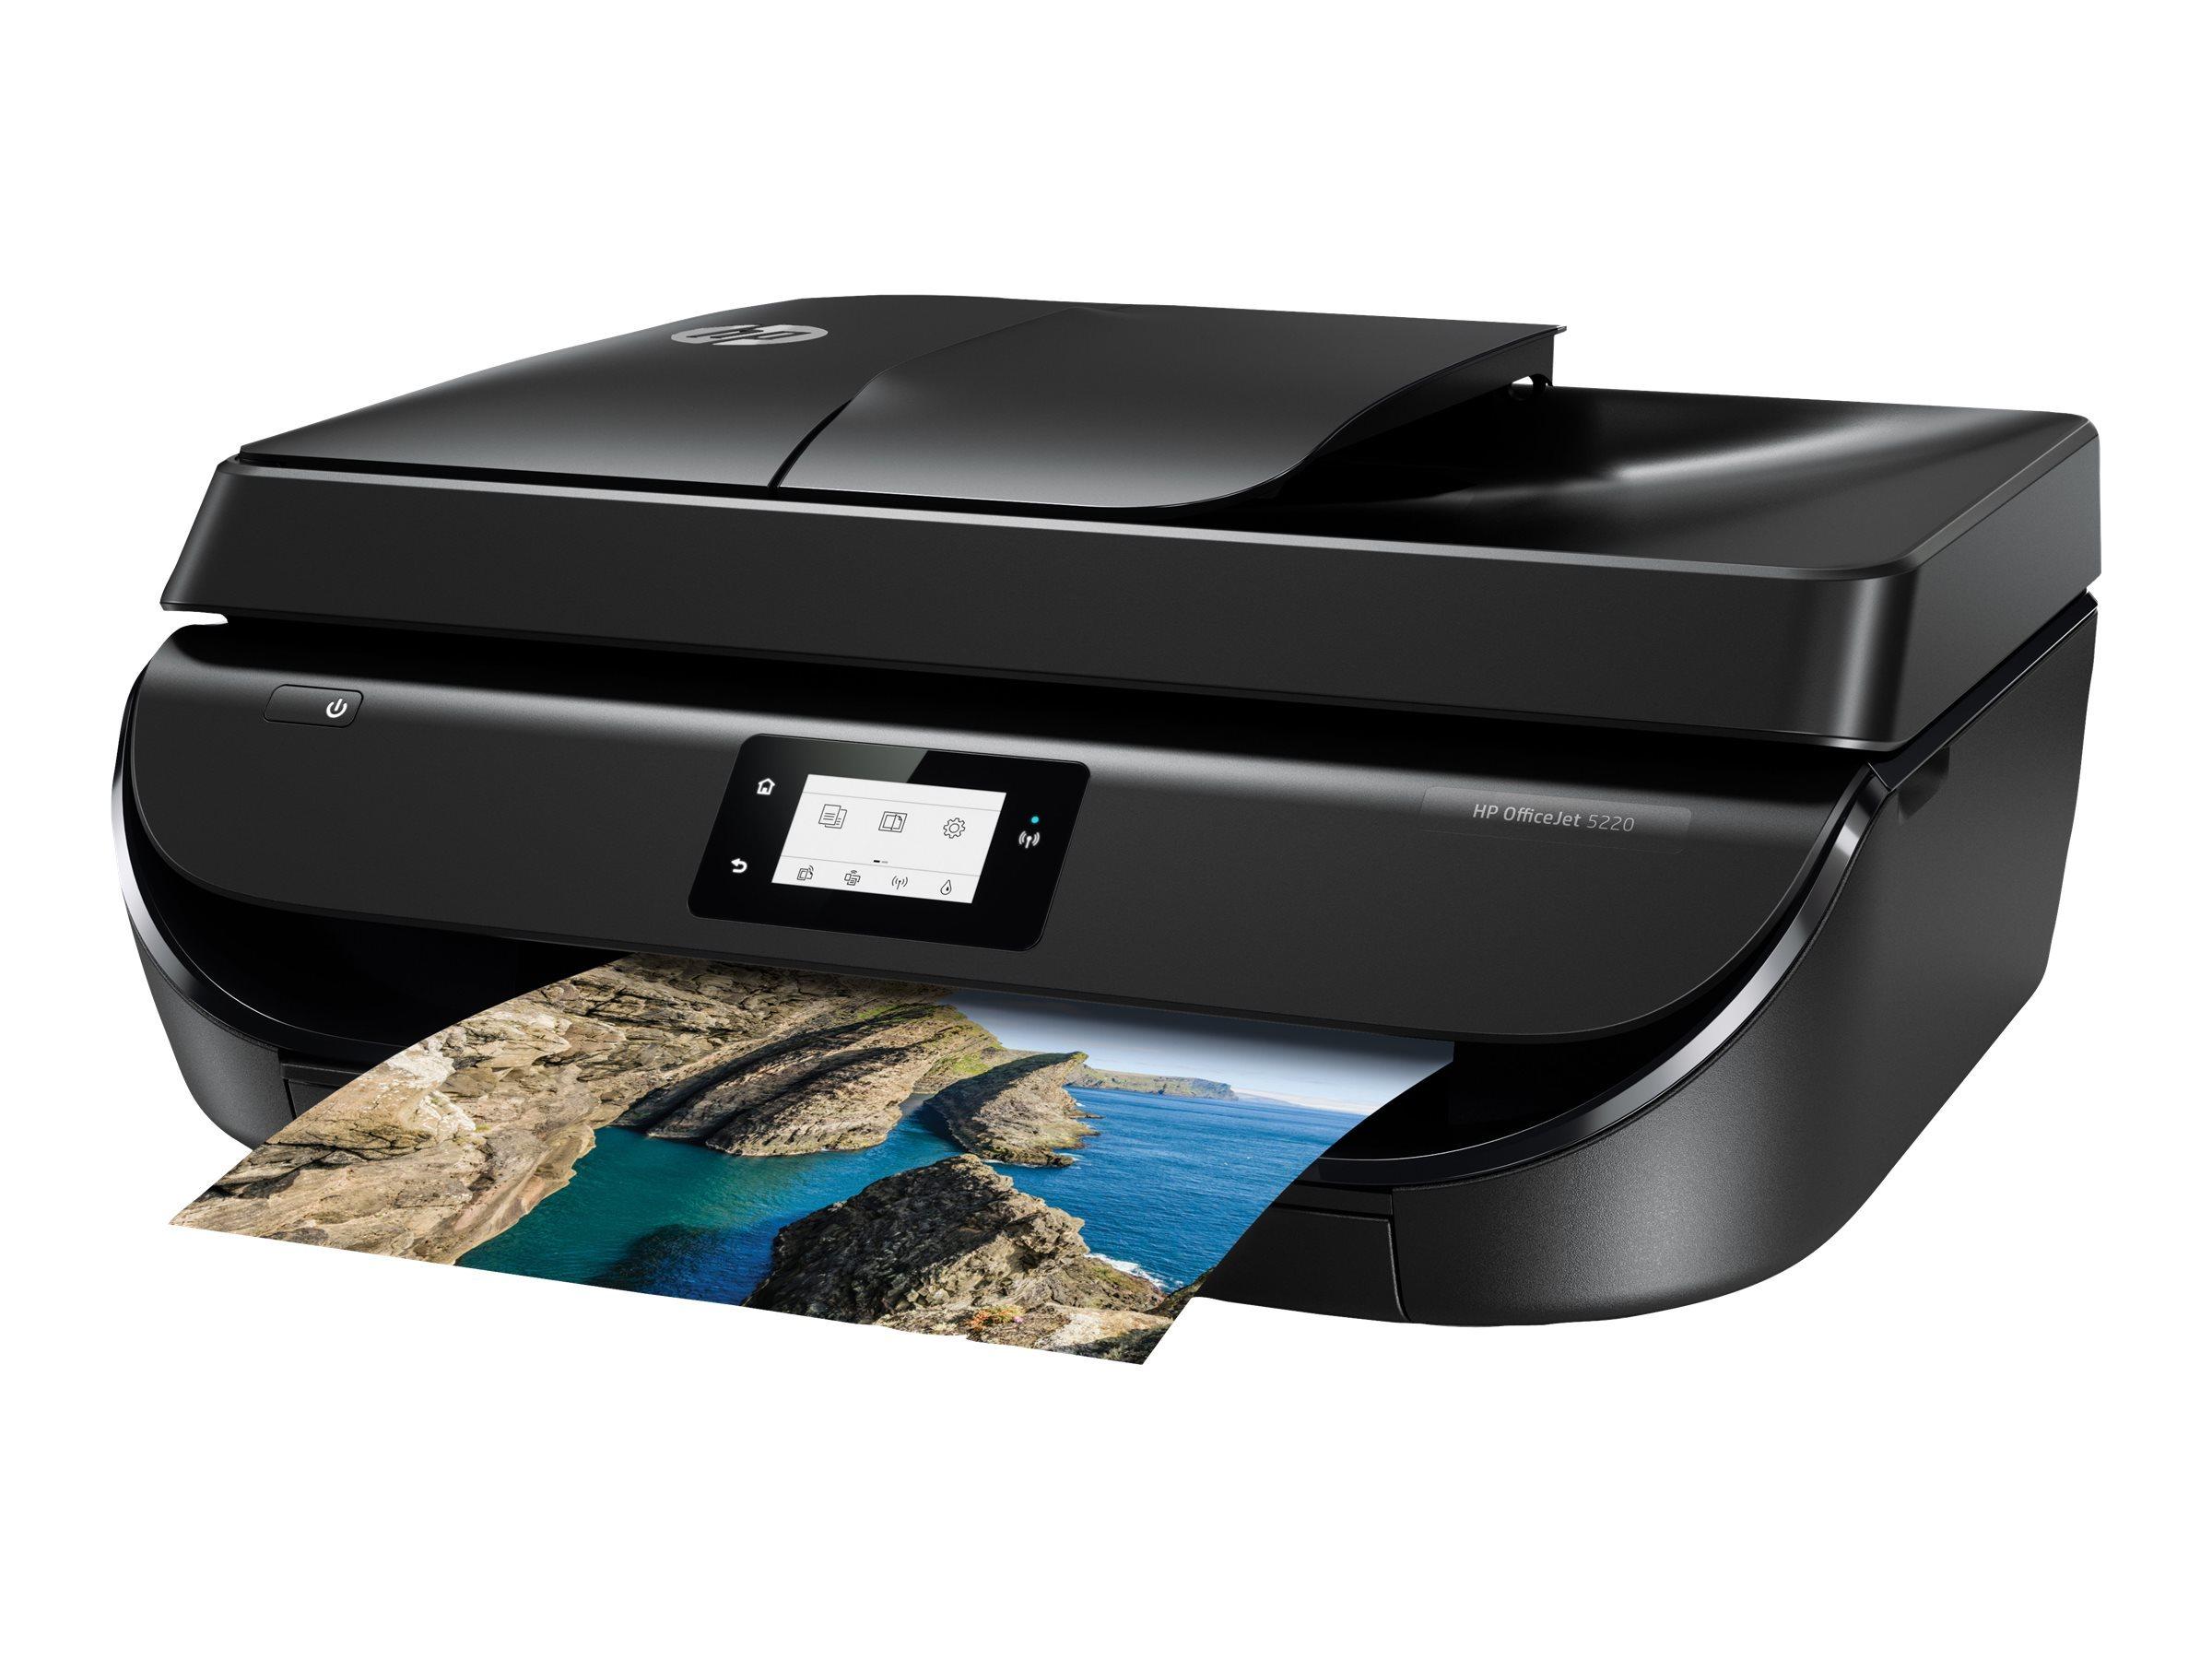 HP Imprimante multifonctions OfficeJet 5220 - M2U81B - Noir